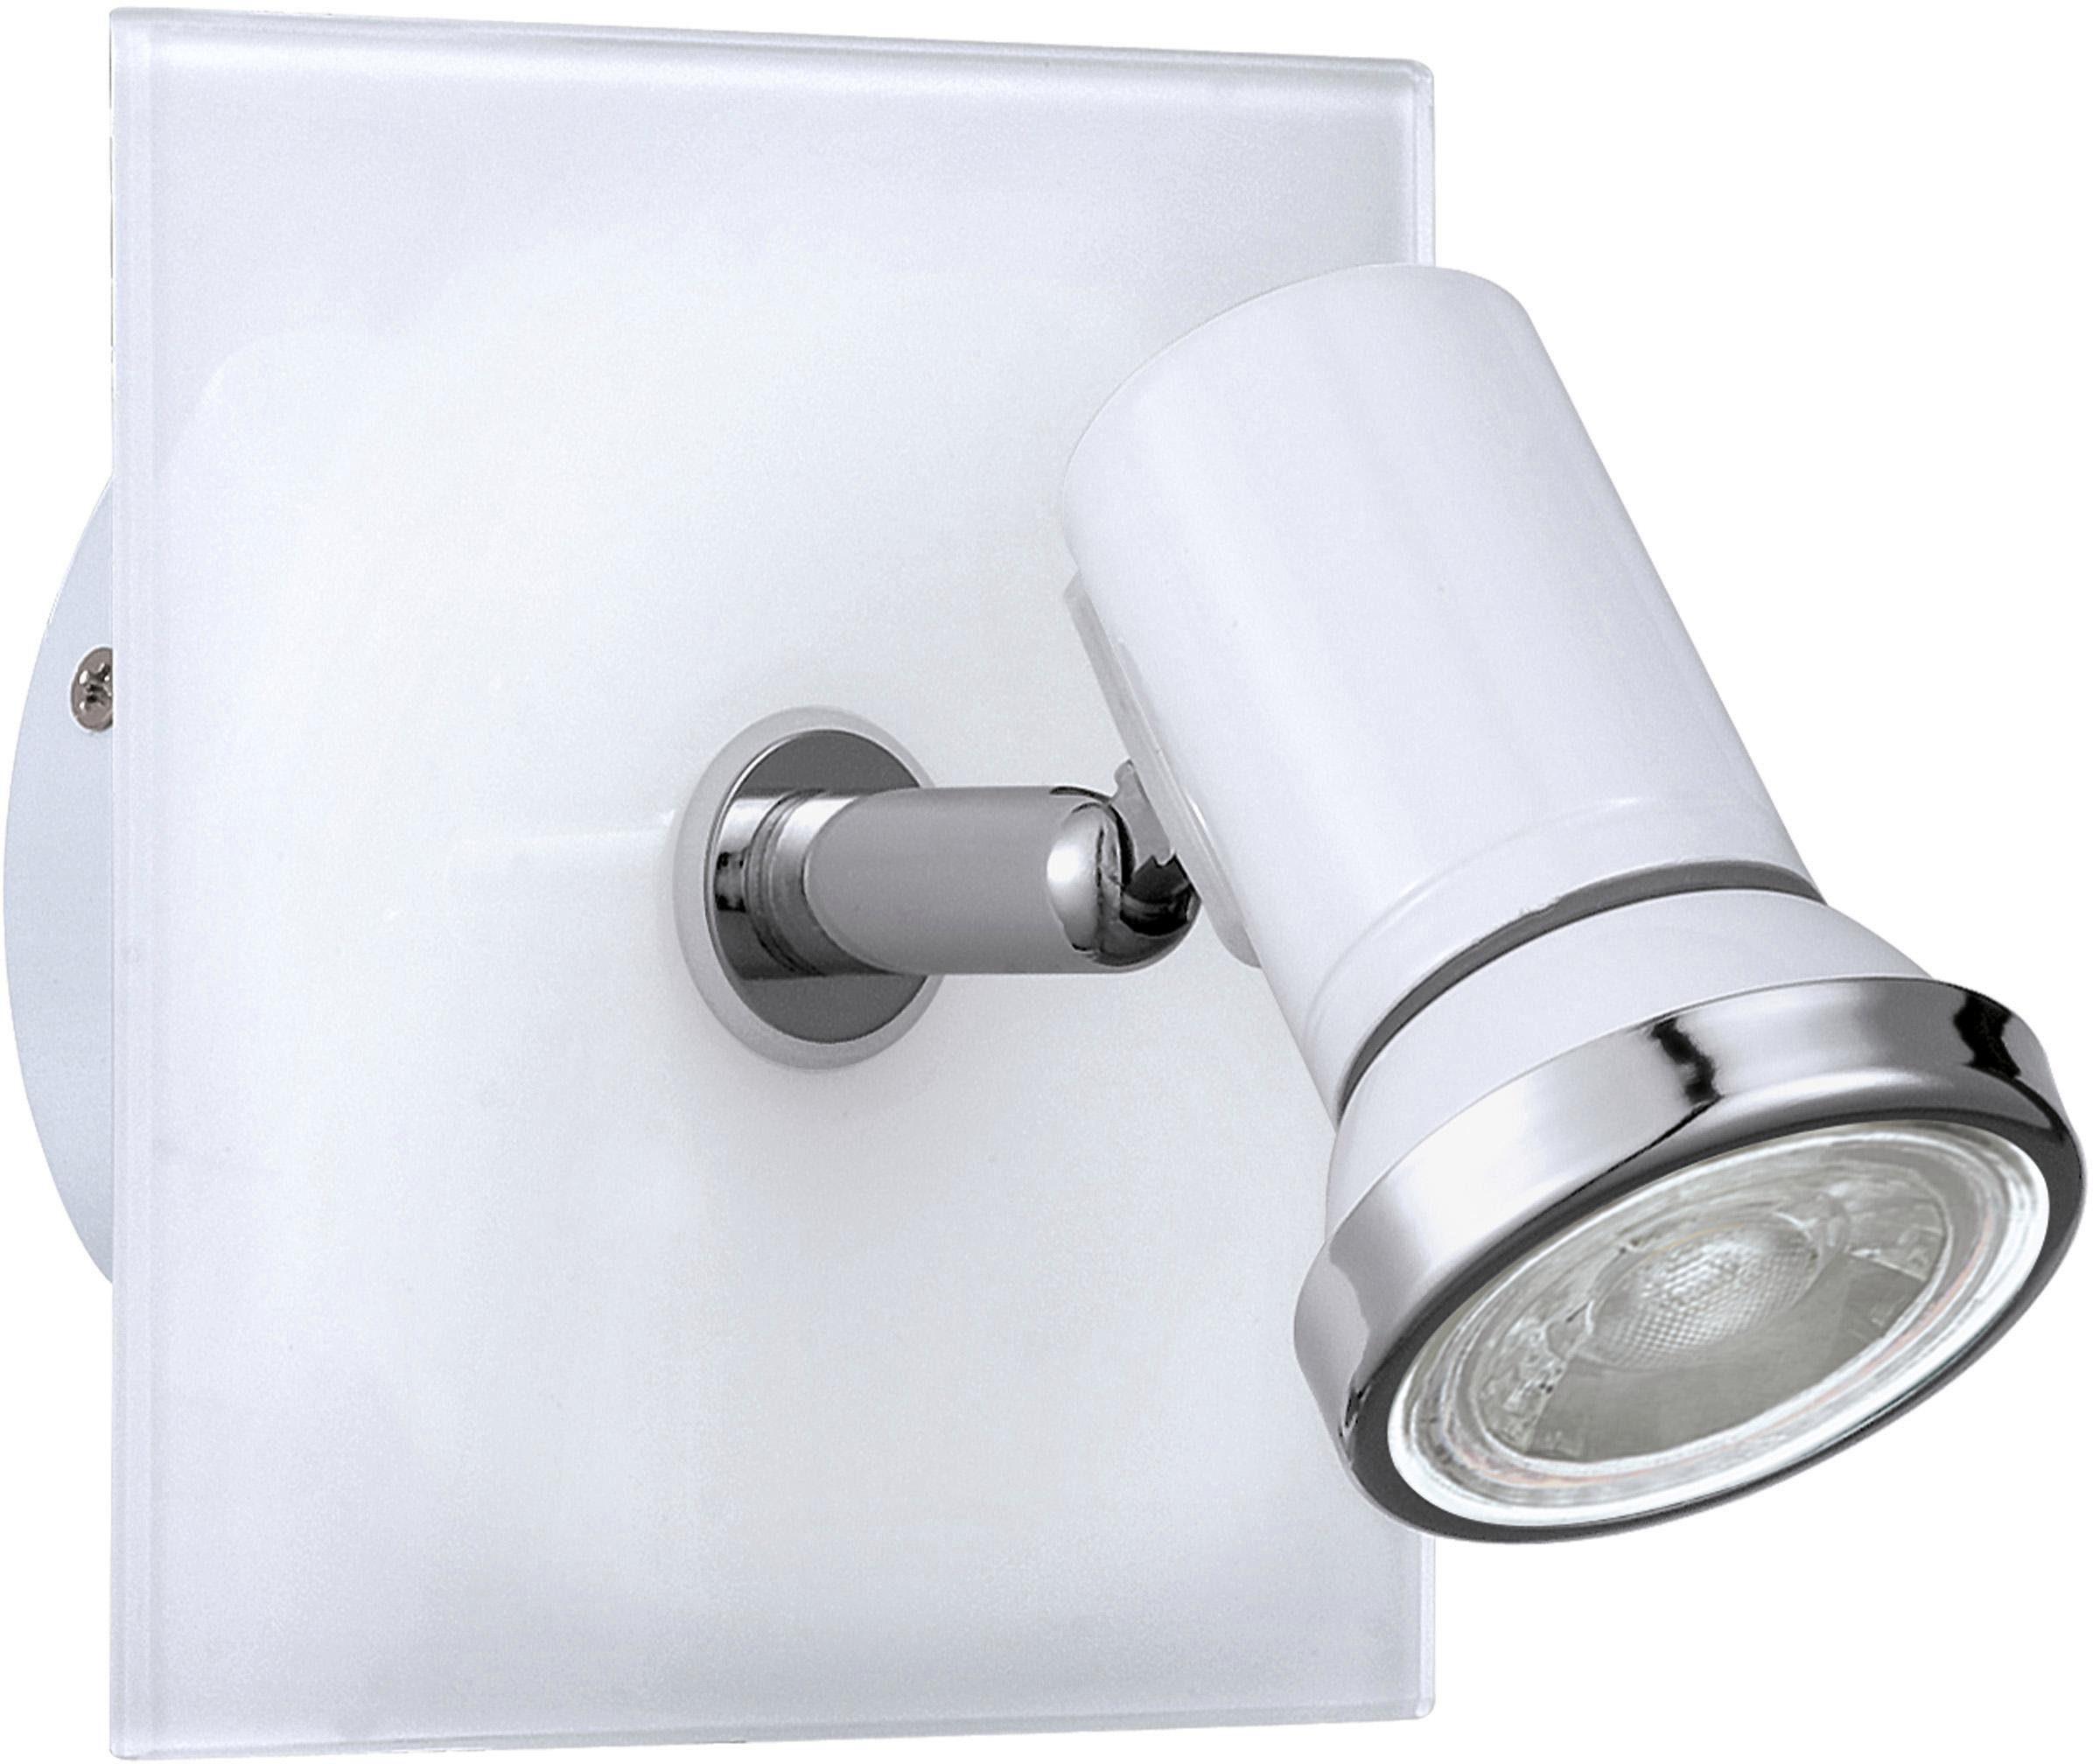 EGLO LED Wandleuchte »TAMARA 1«, 1 flammig kaufen | OTTO